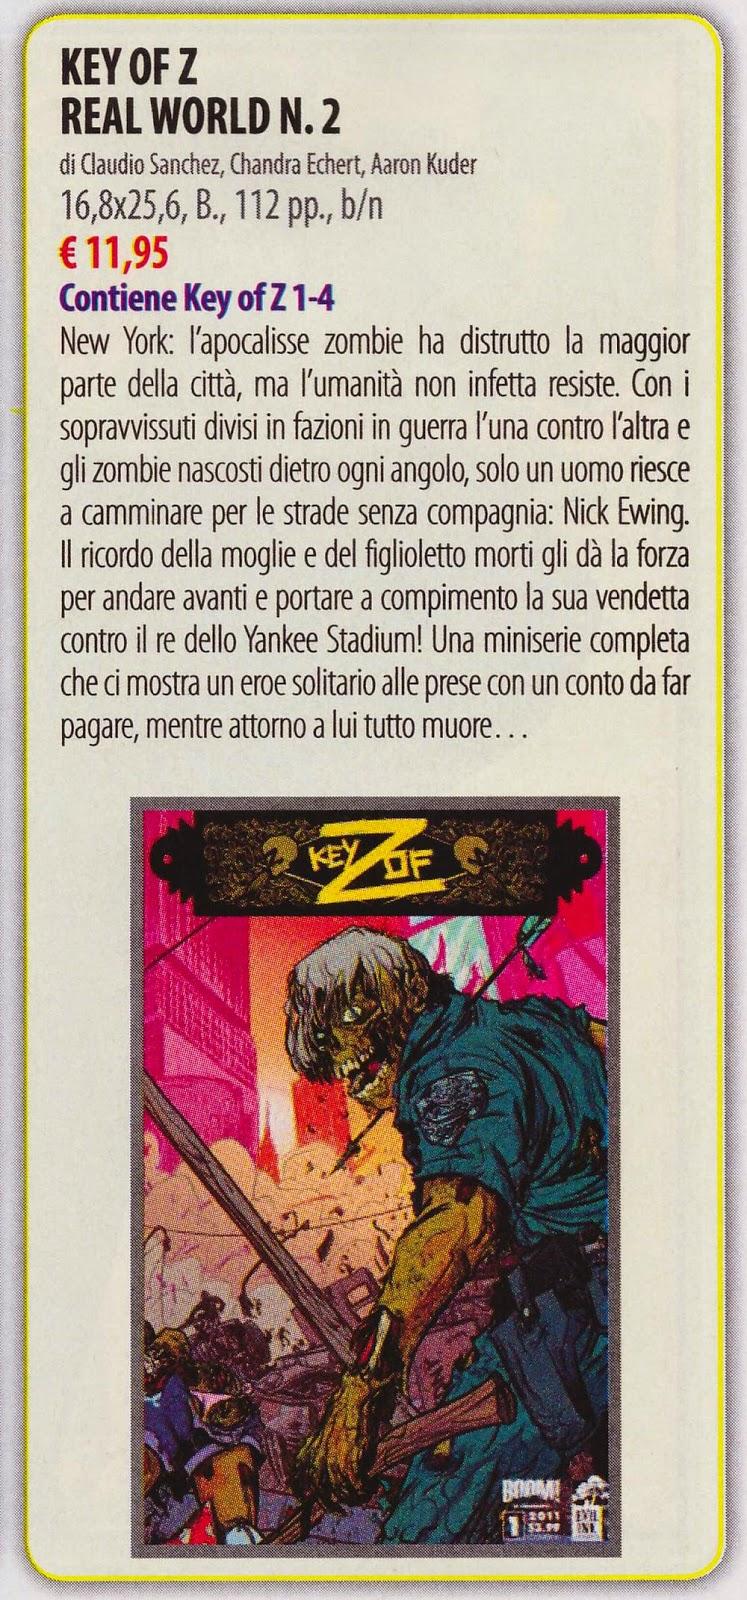 Key of Z (Anteprima #281)